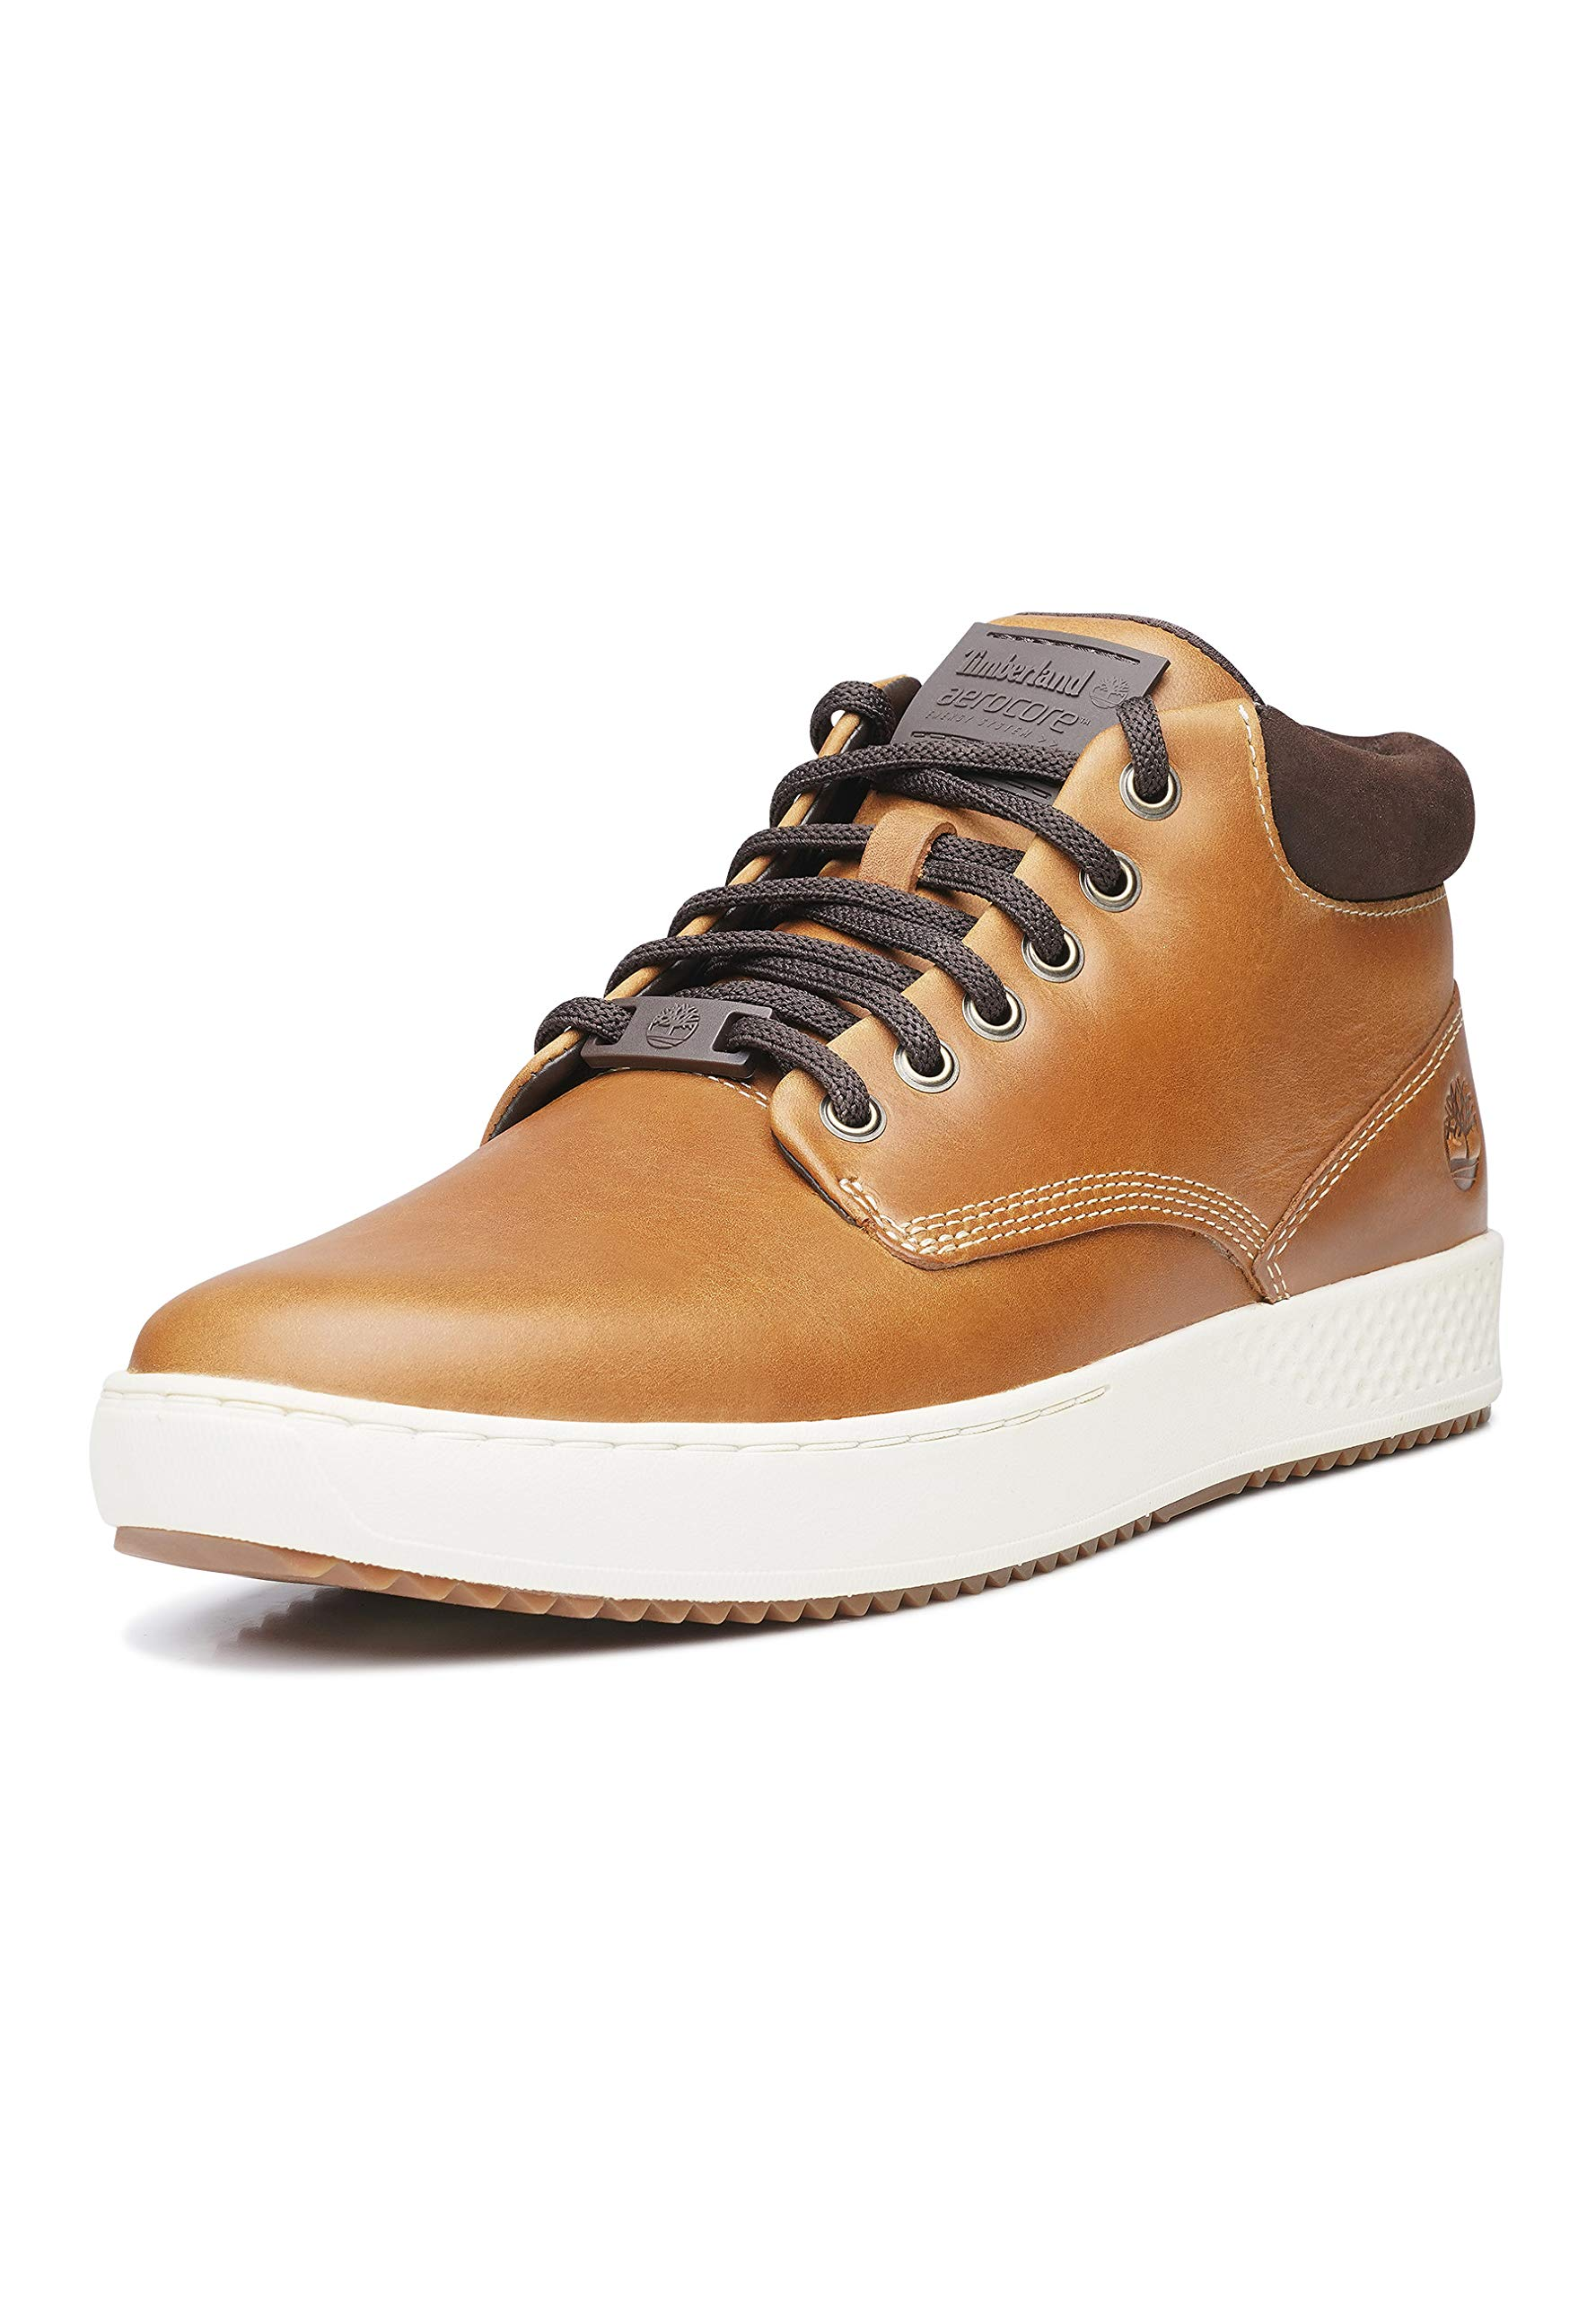 En detalle Anuncio Lograr  Timberland Men's Bradstreet Leather Sensorflex Chukka Sneakers- Buy Online  in Burundi at burundi.desertcart.com. ProductId : 119673909.